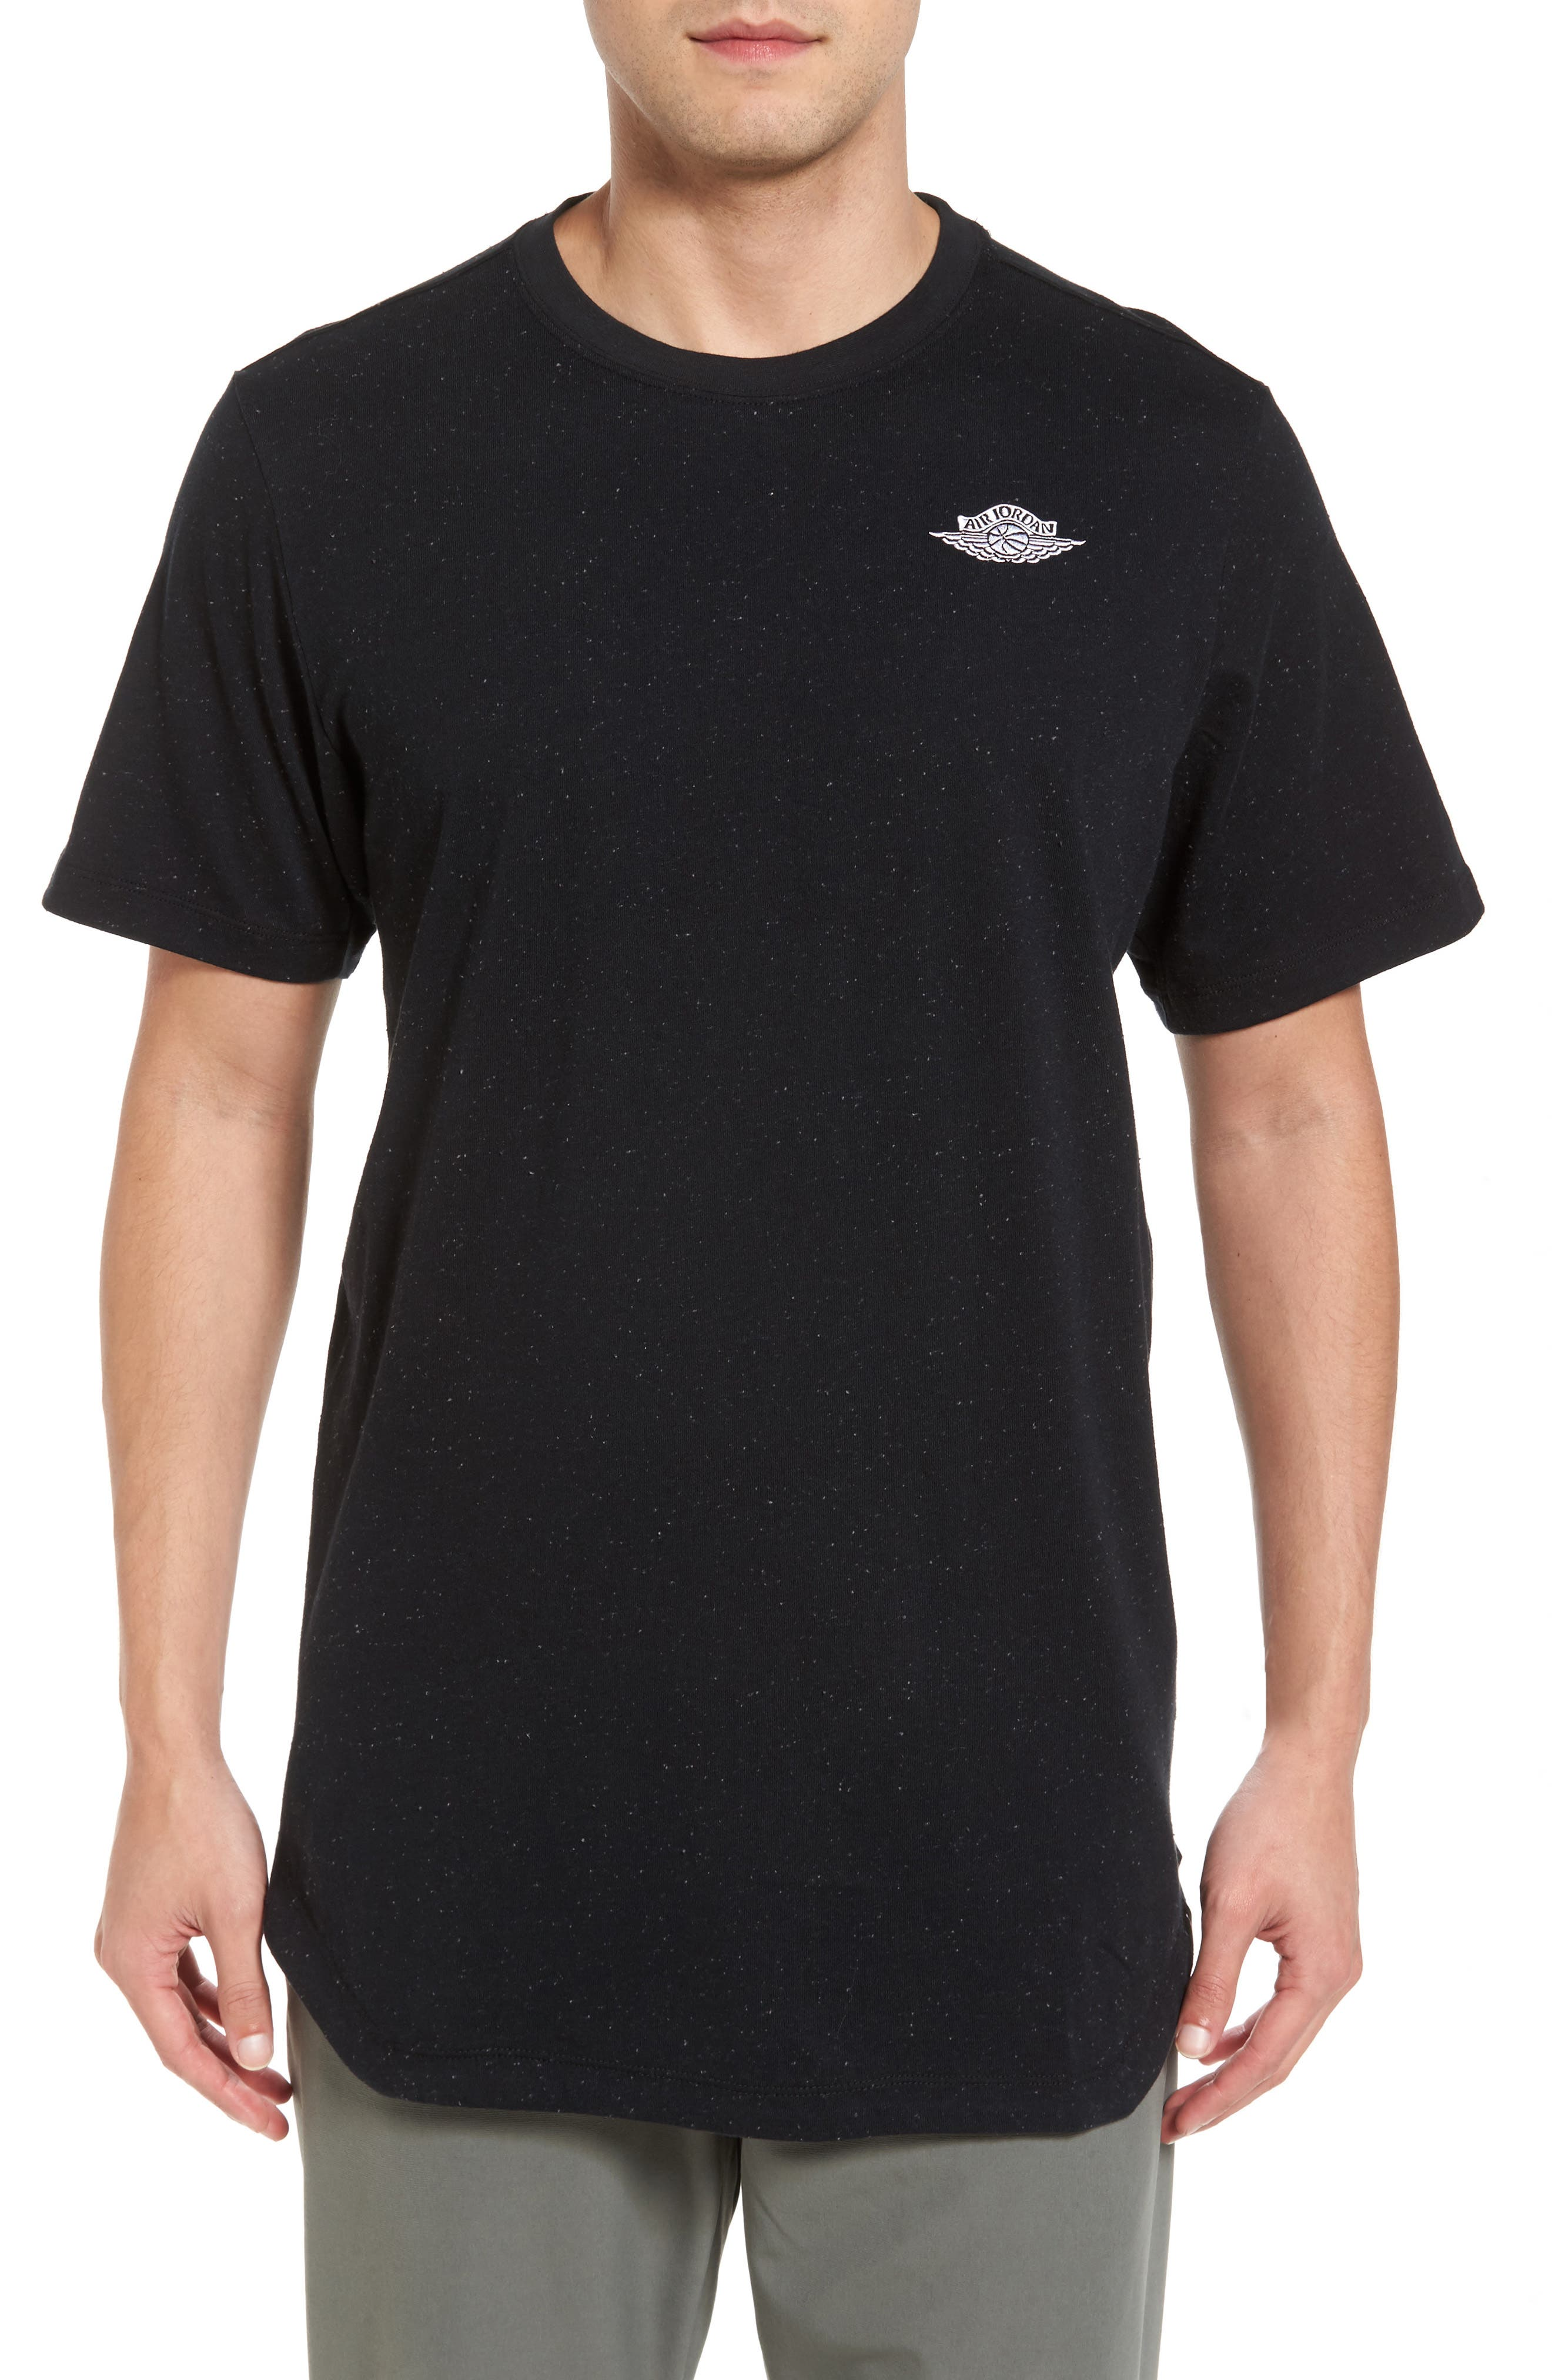 Future 2 T-Shirt,                         Main,                         color, 010